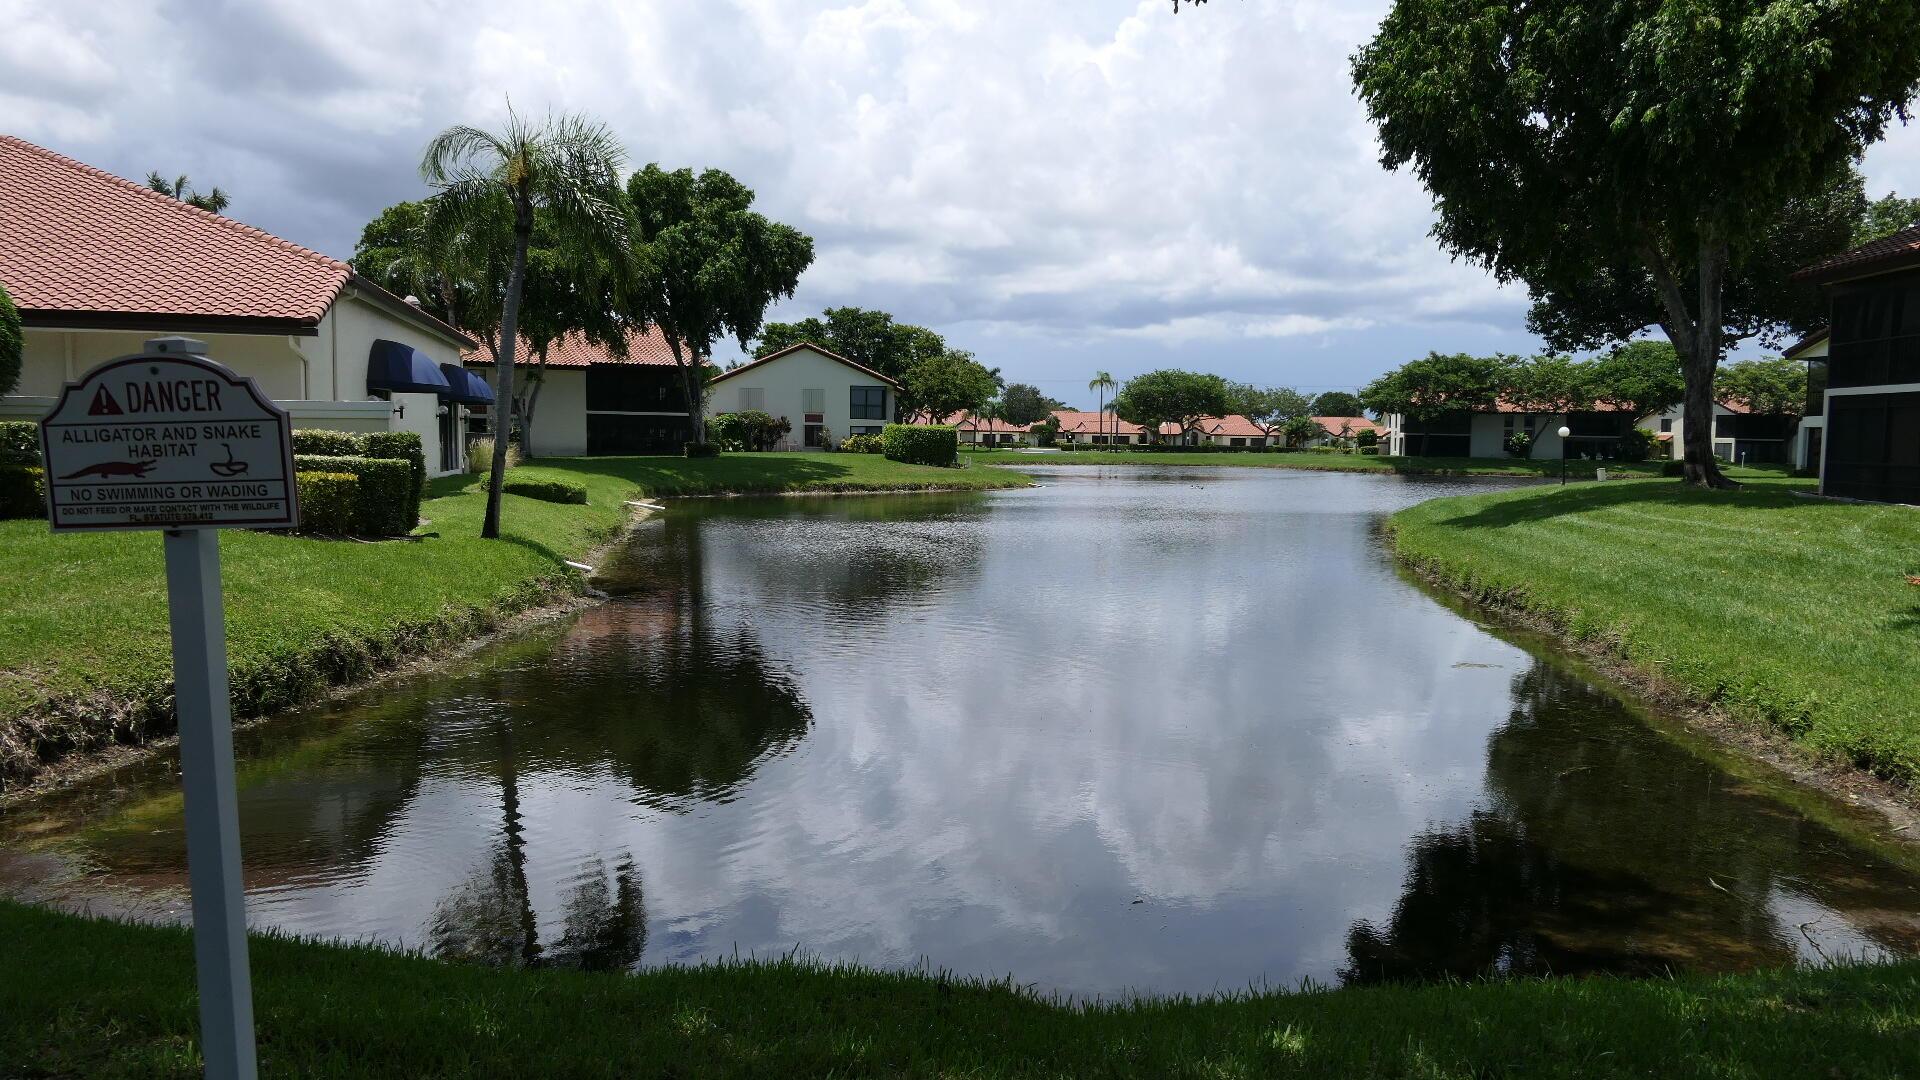 10804 Bahama Palm Way 101 Boynton Beach, FL 33437 photo 56